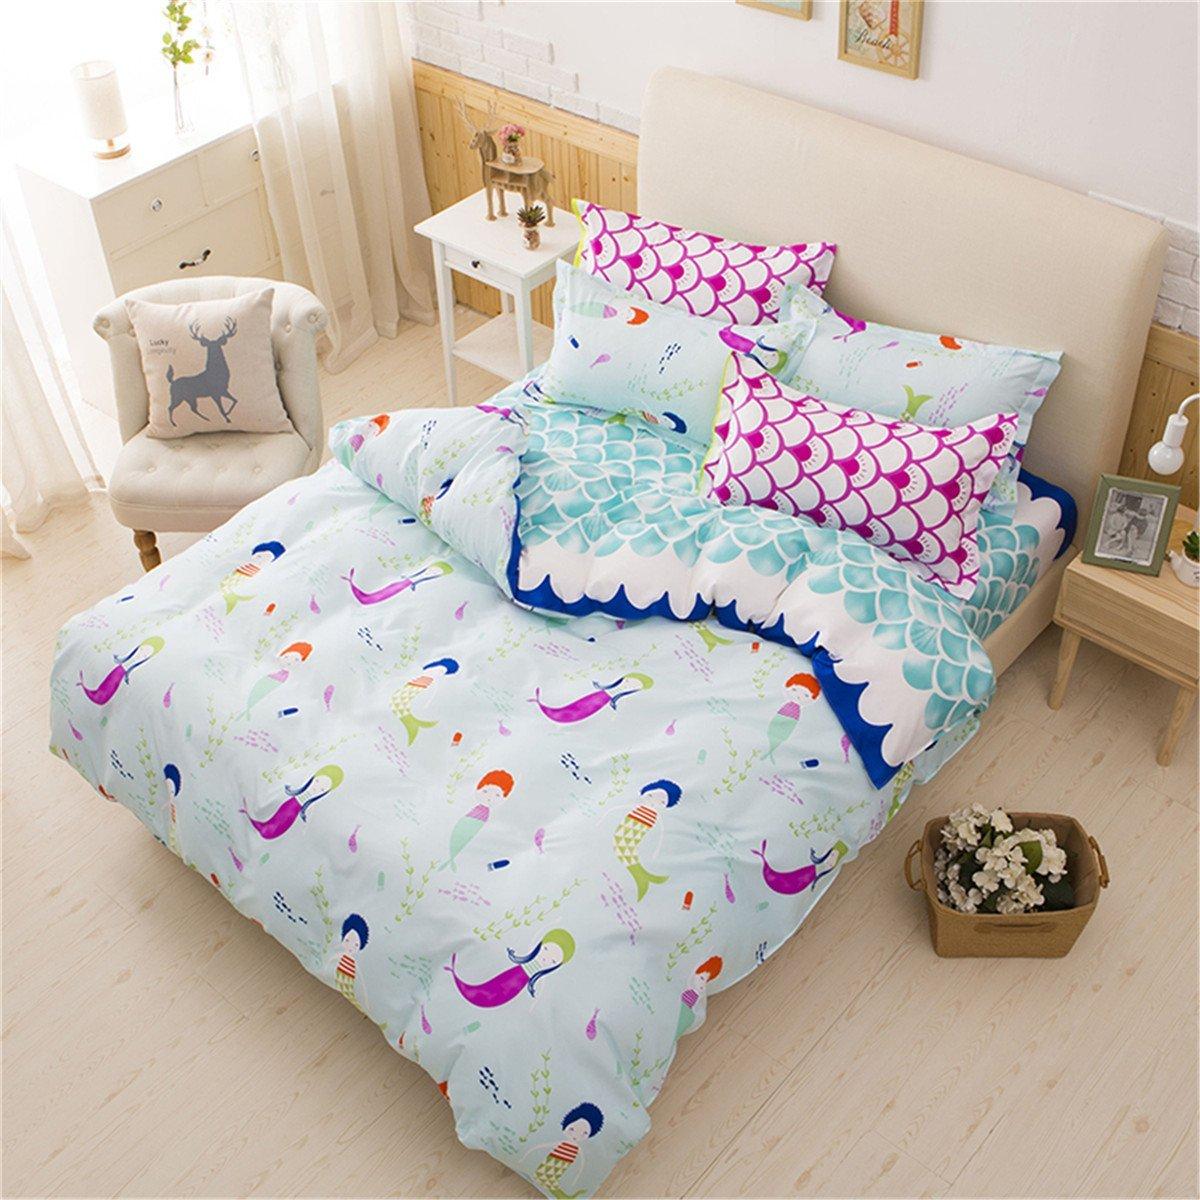 365dd8ef18e276 Get Quotations · Sookie 3 Pieces Blue Duvet Small Mermaid Bedding Set Full/ Queen Kids Girls,(